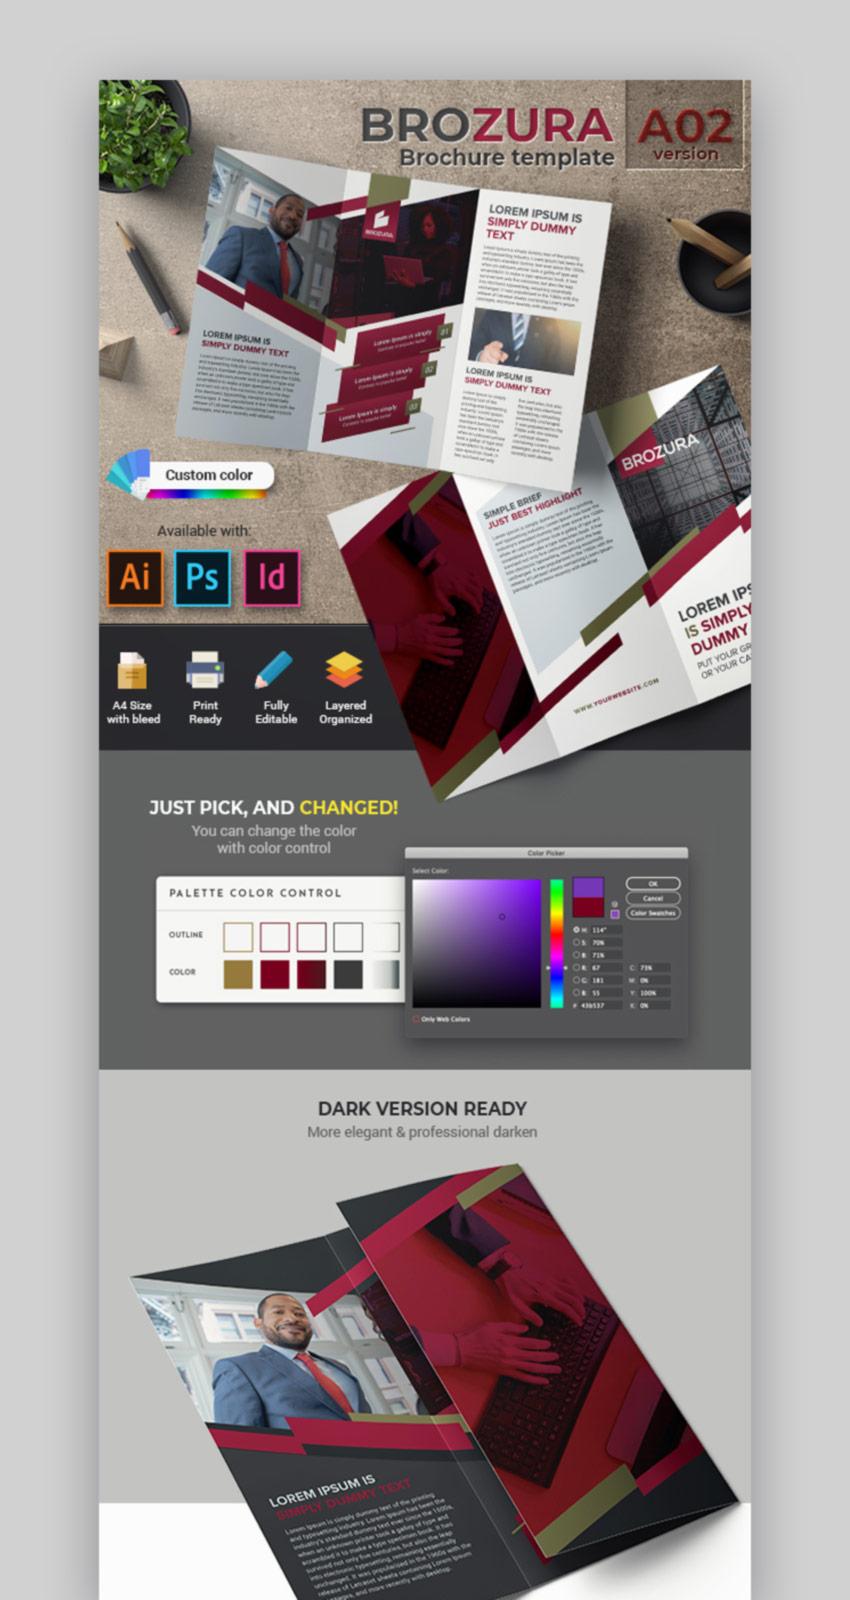 Brozura Serie A02 - Brochure Template